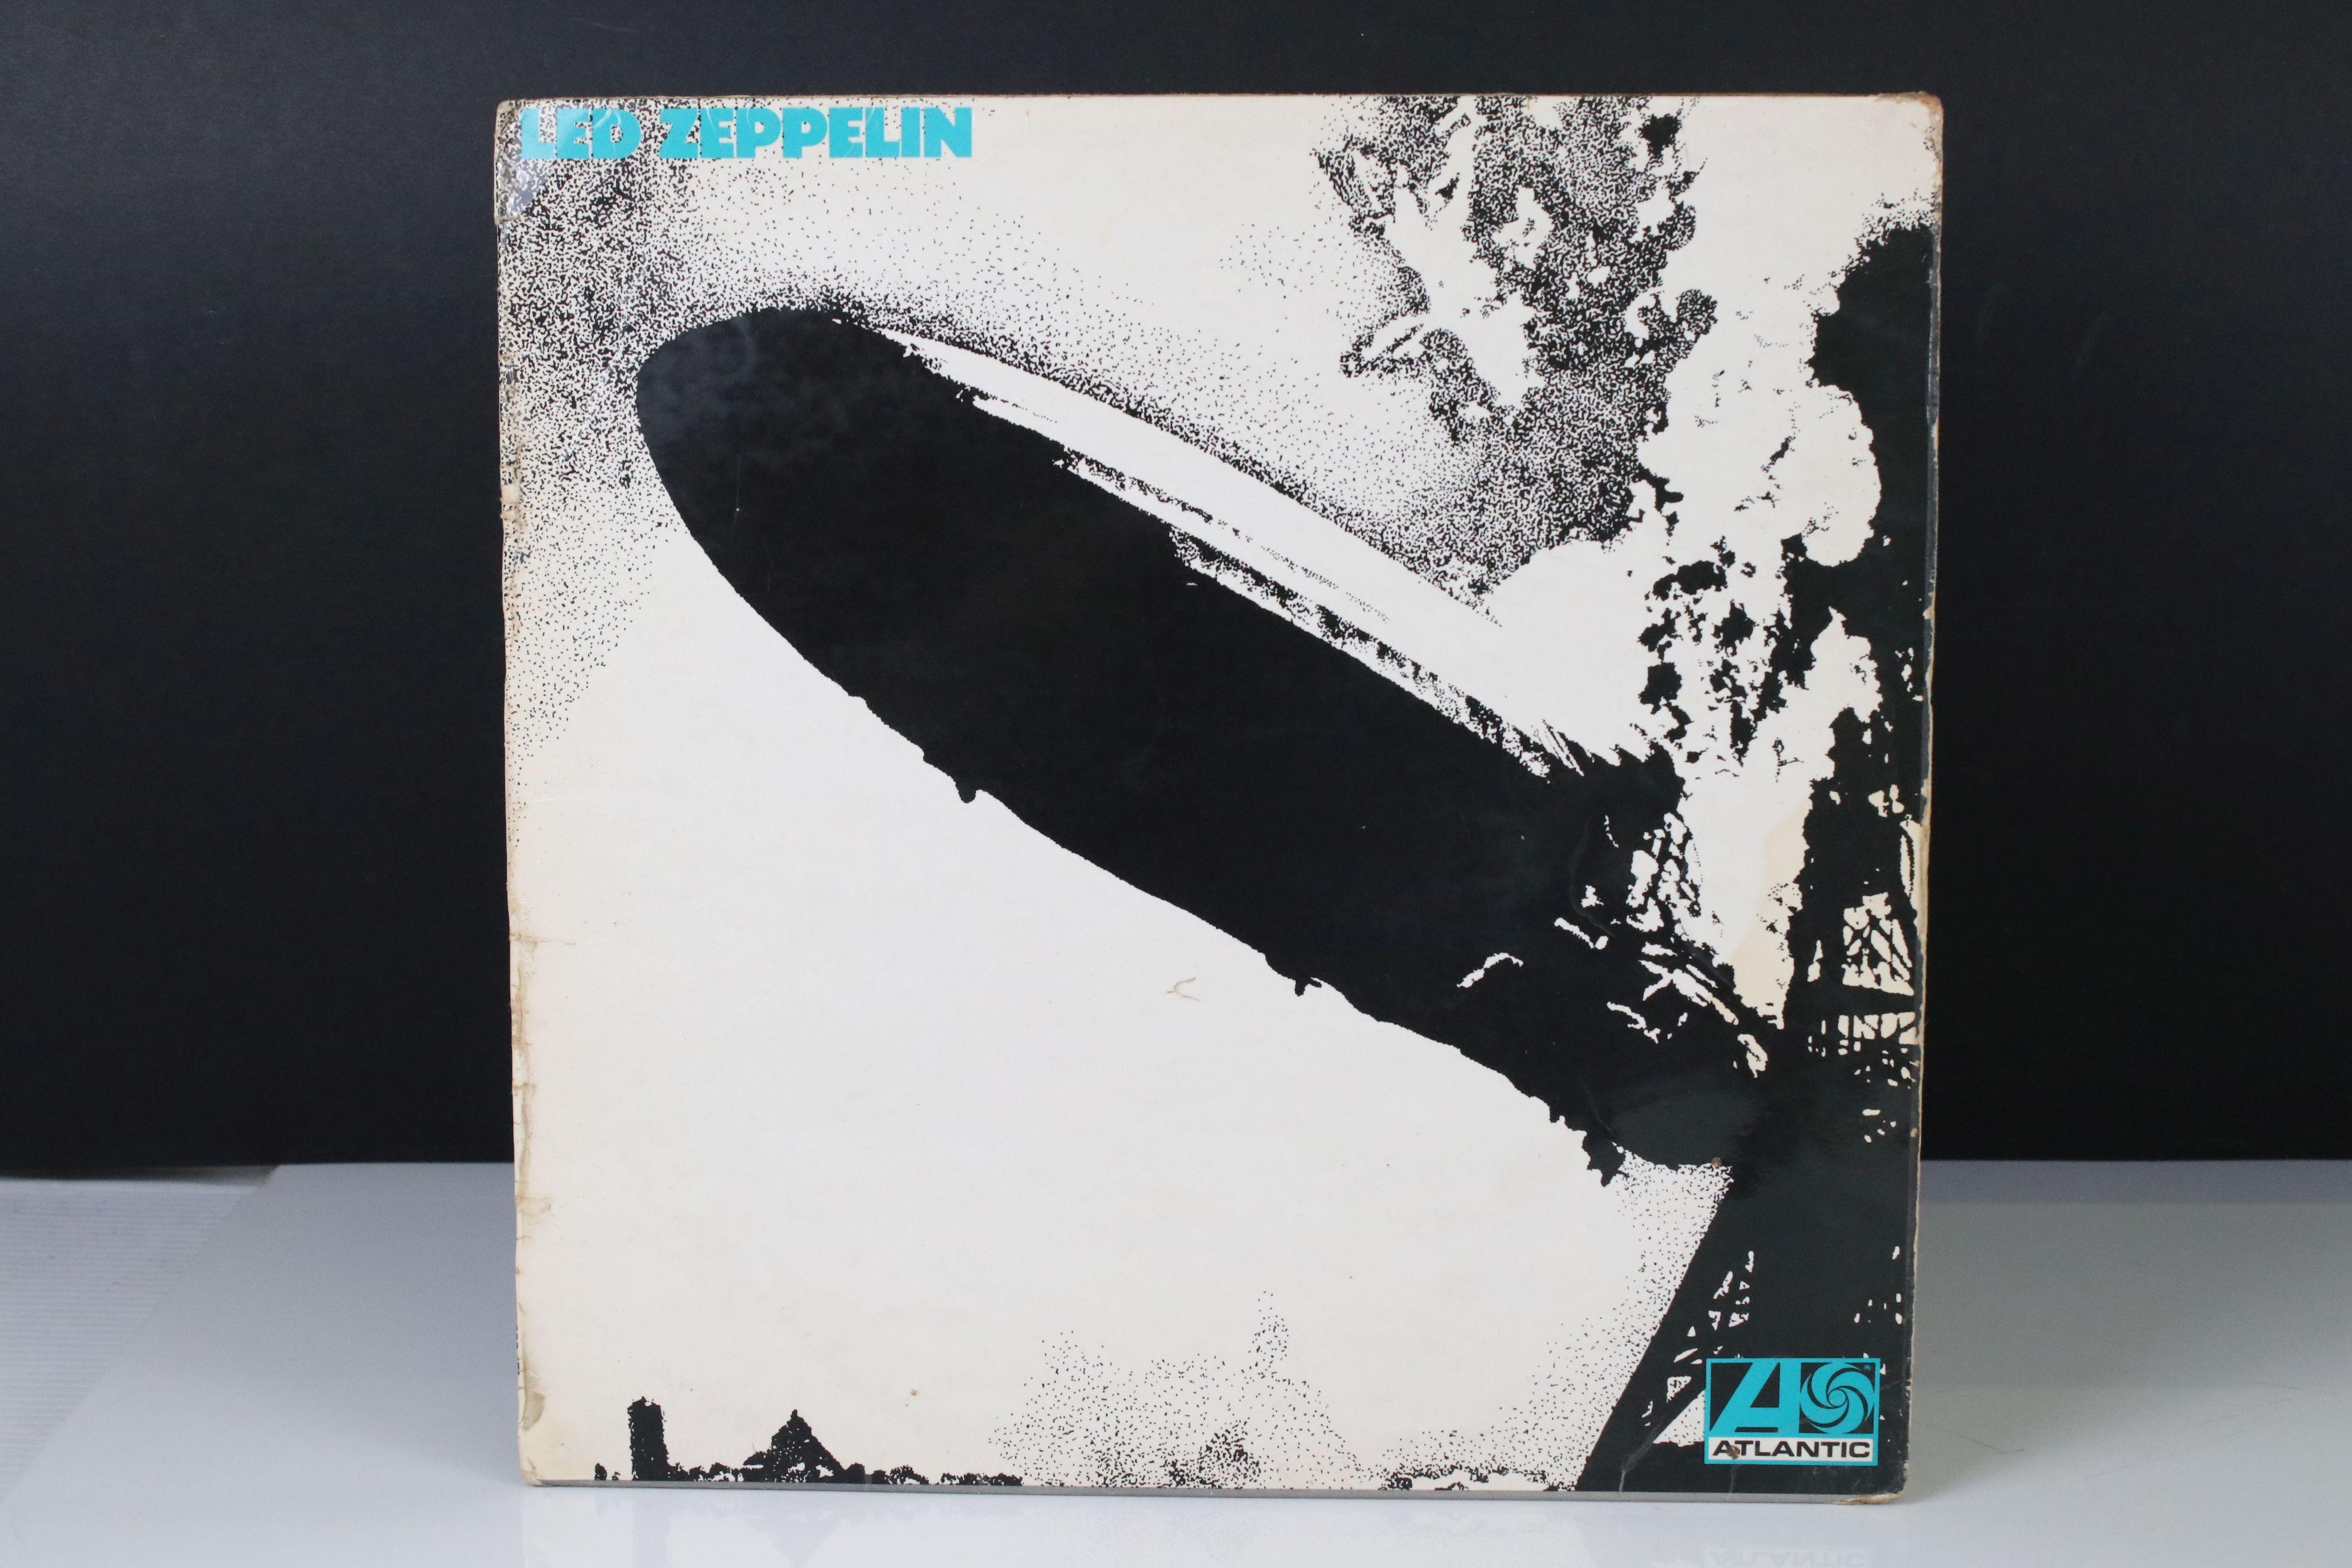 Vinyl - Led Zeppelin One (588171) Atlantic red/maroon label, Superhype publishing credit,